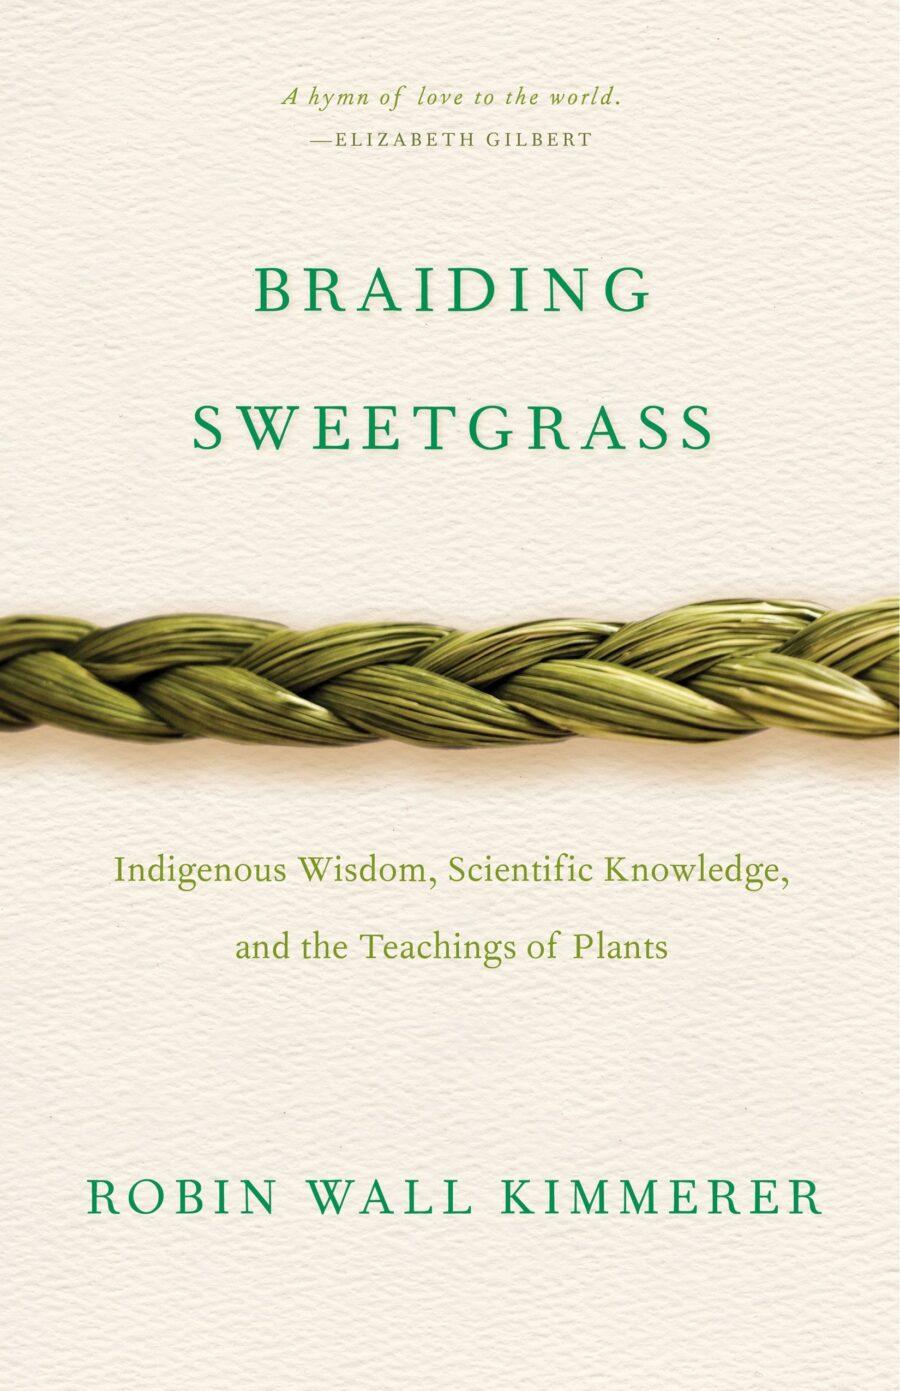 BraidingSweetgrass